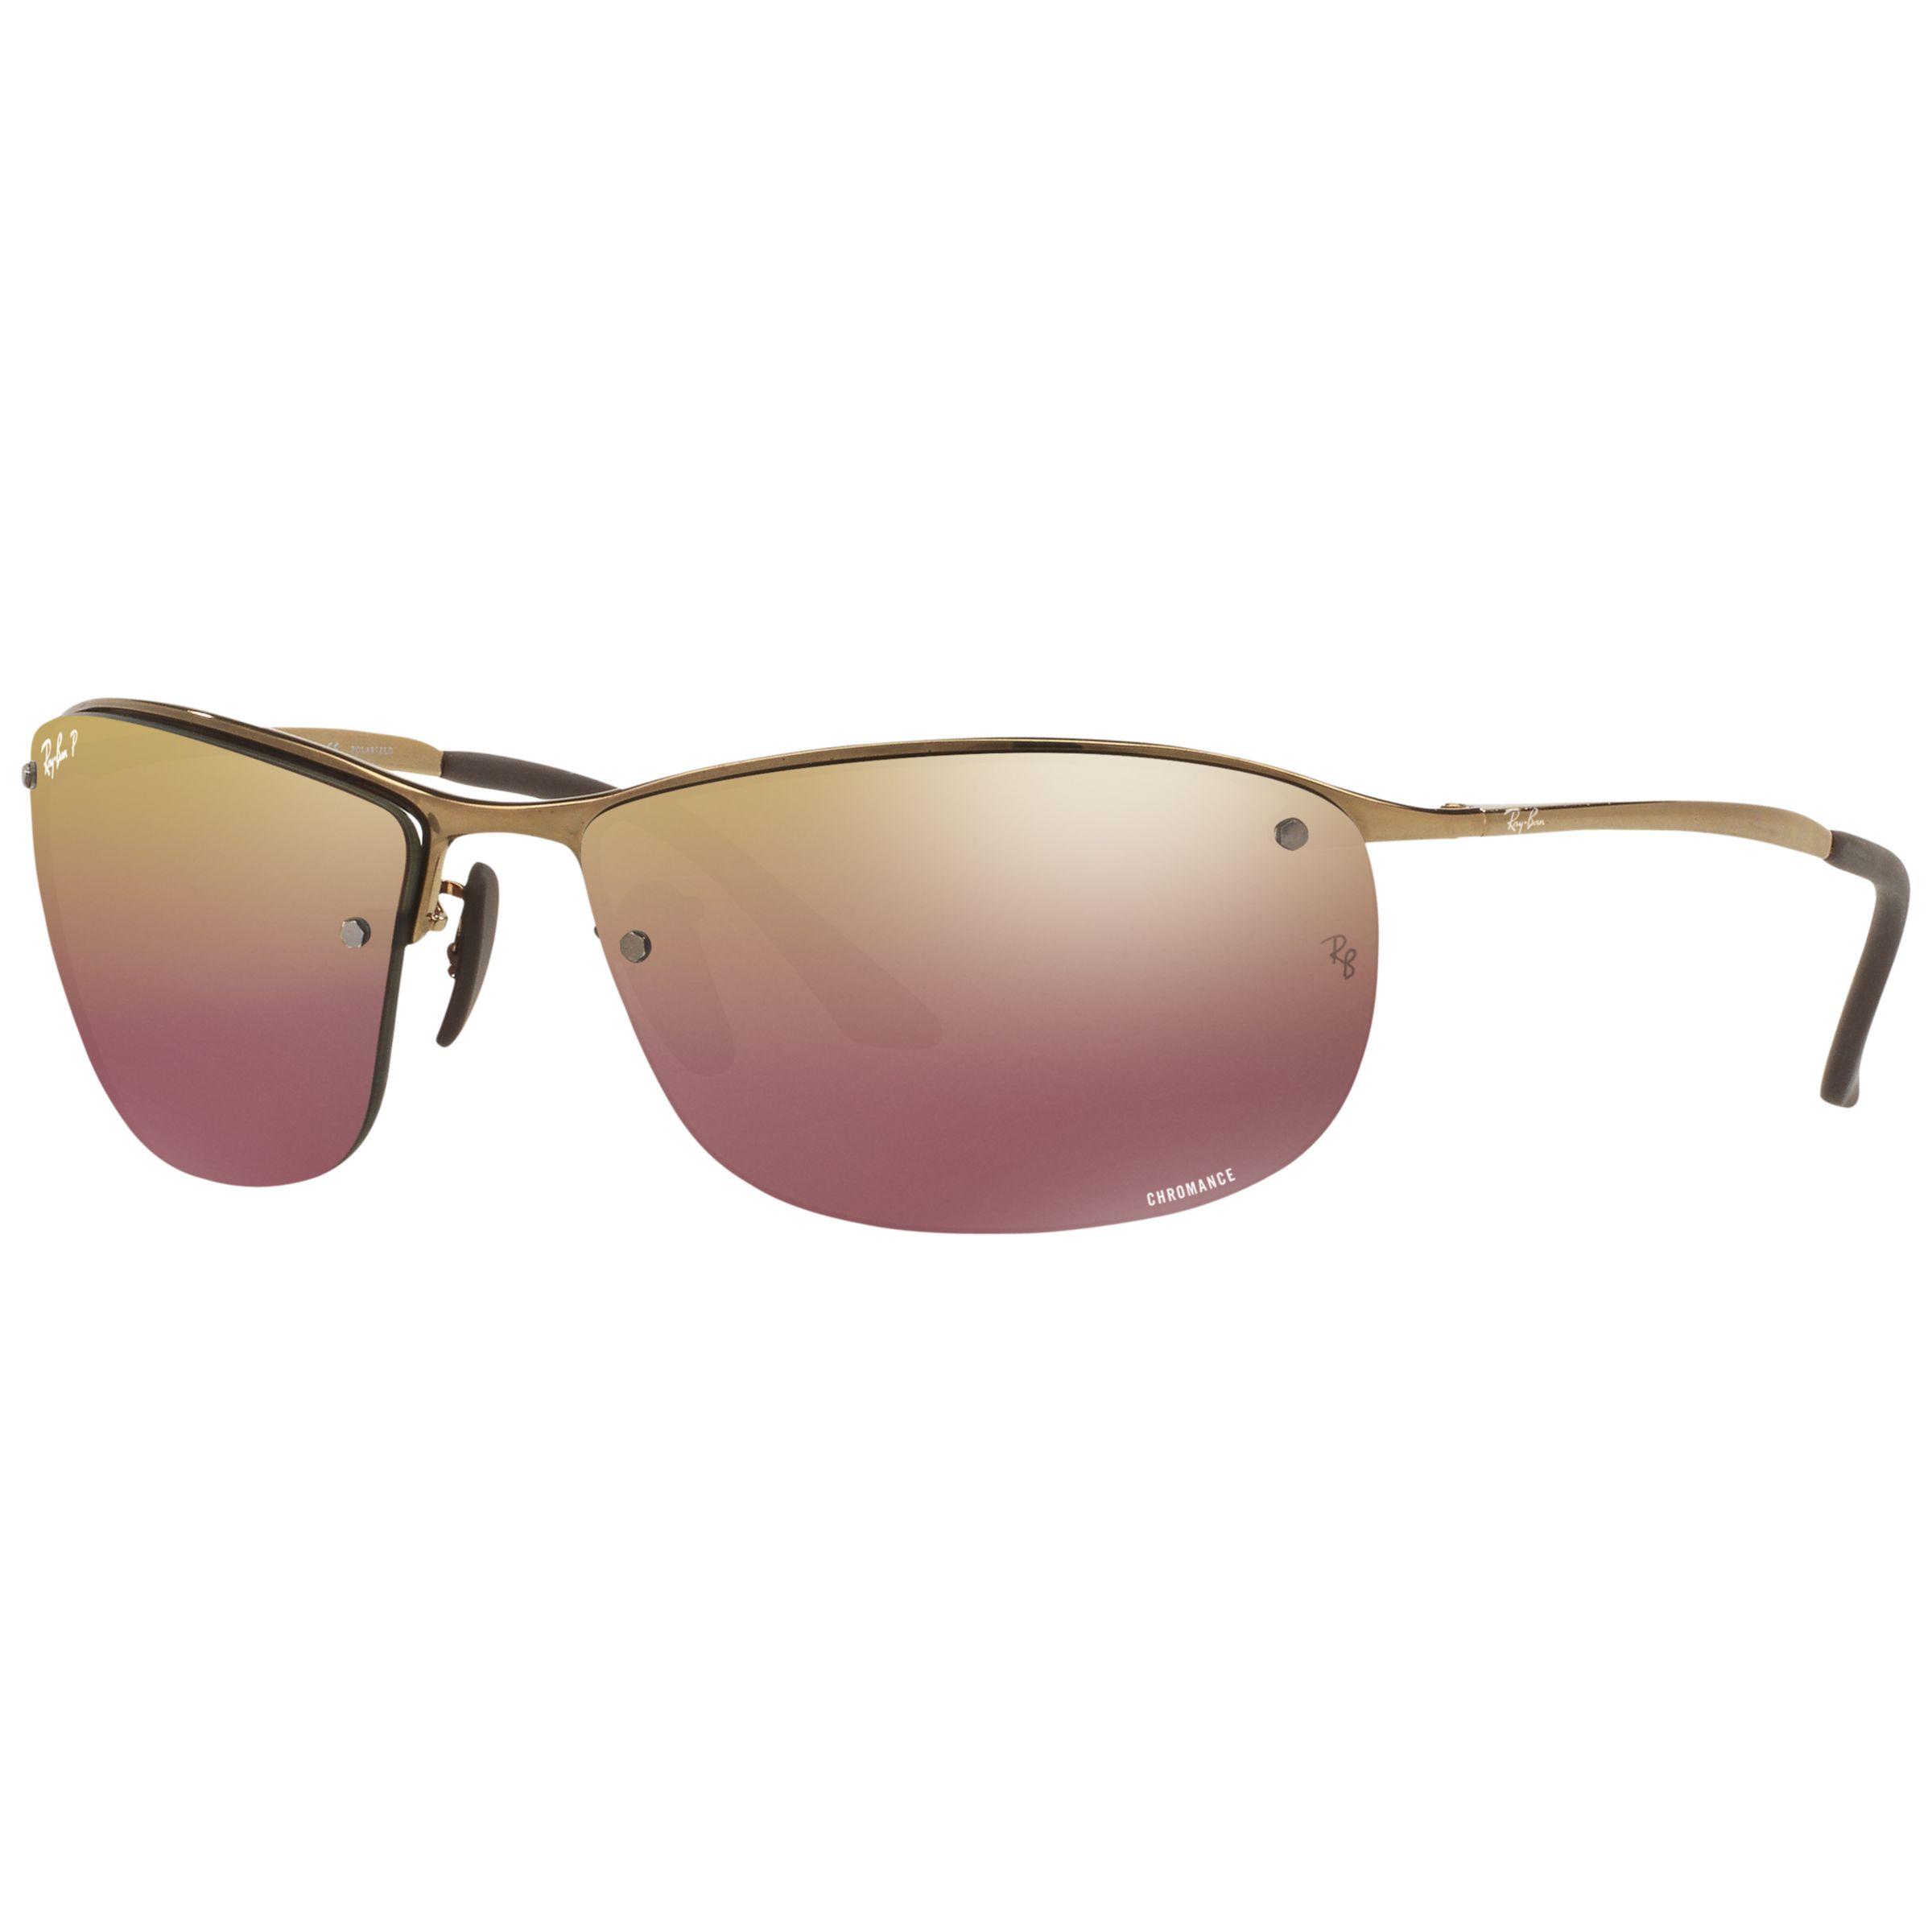 129af4c6b7 Ray-Ban RB3542 Polarised Chromance Rectangular Sunglasses at John Lewis    Partners